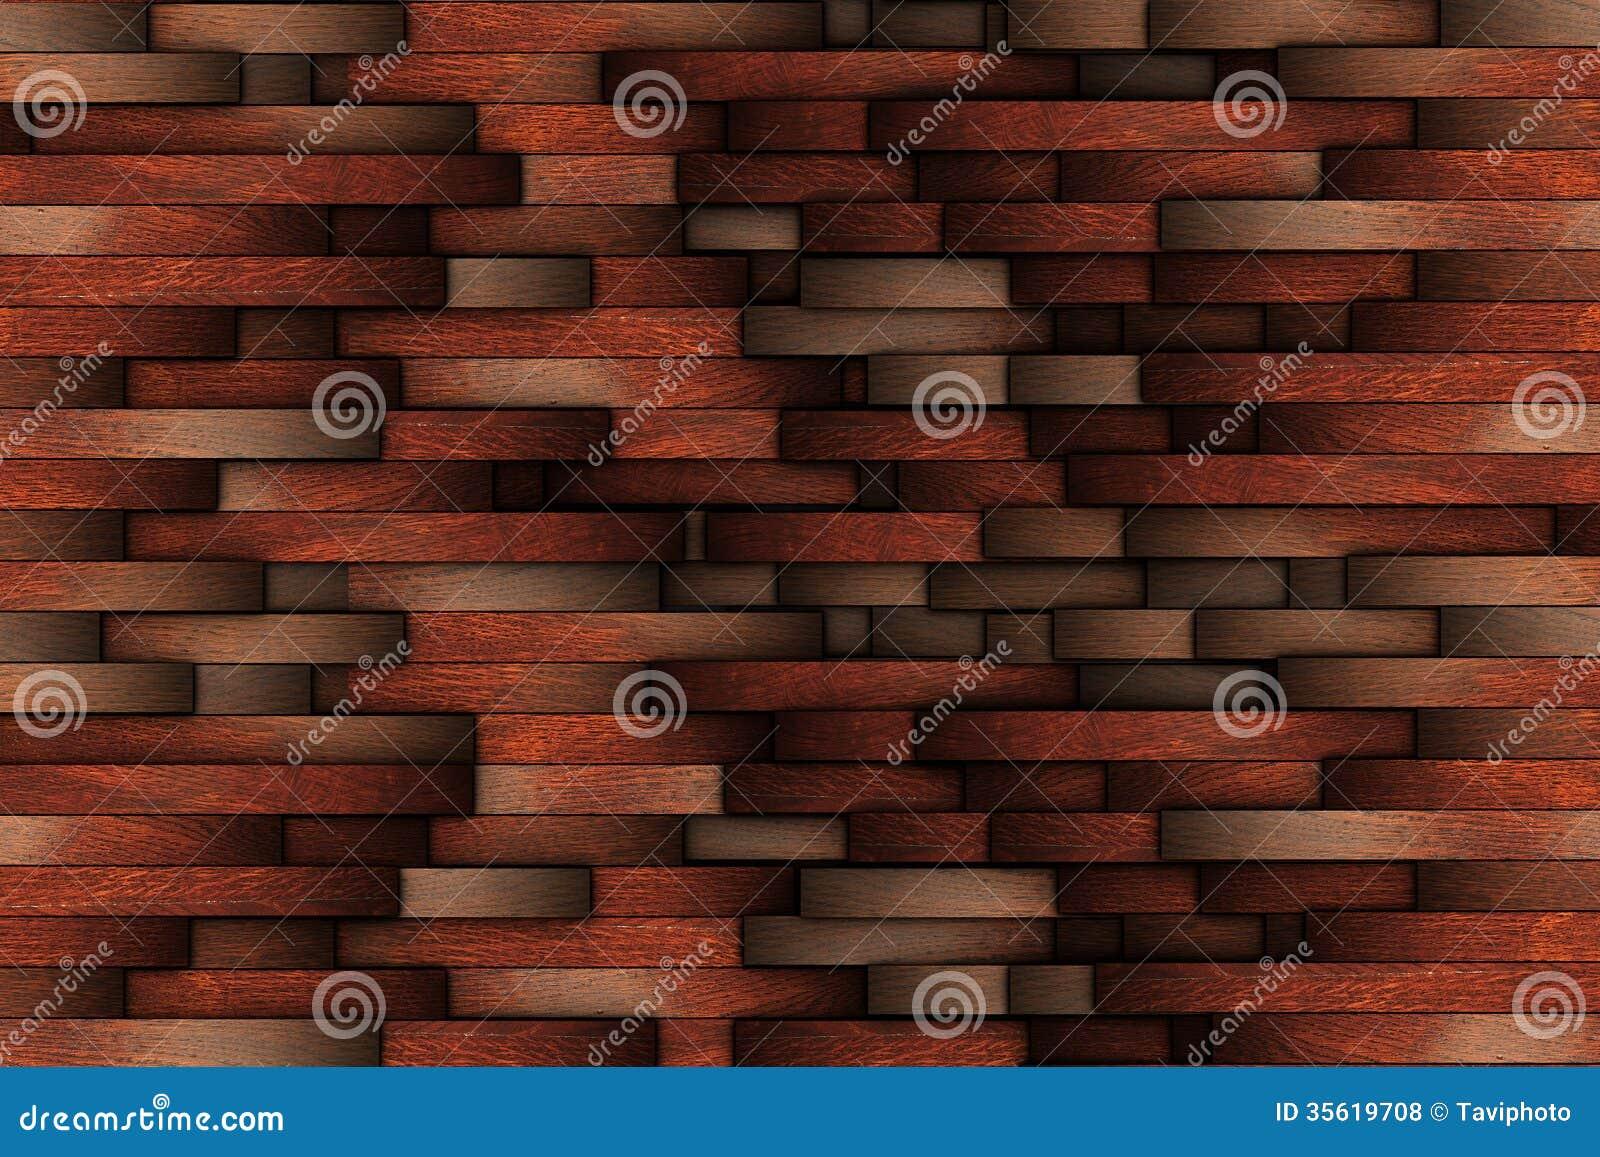 Mahogany Abstract Wooden Wall Design Royalty Free Stock